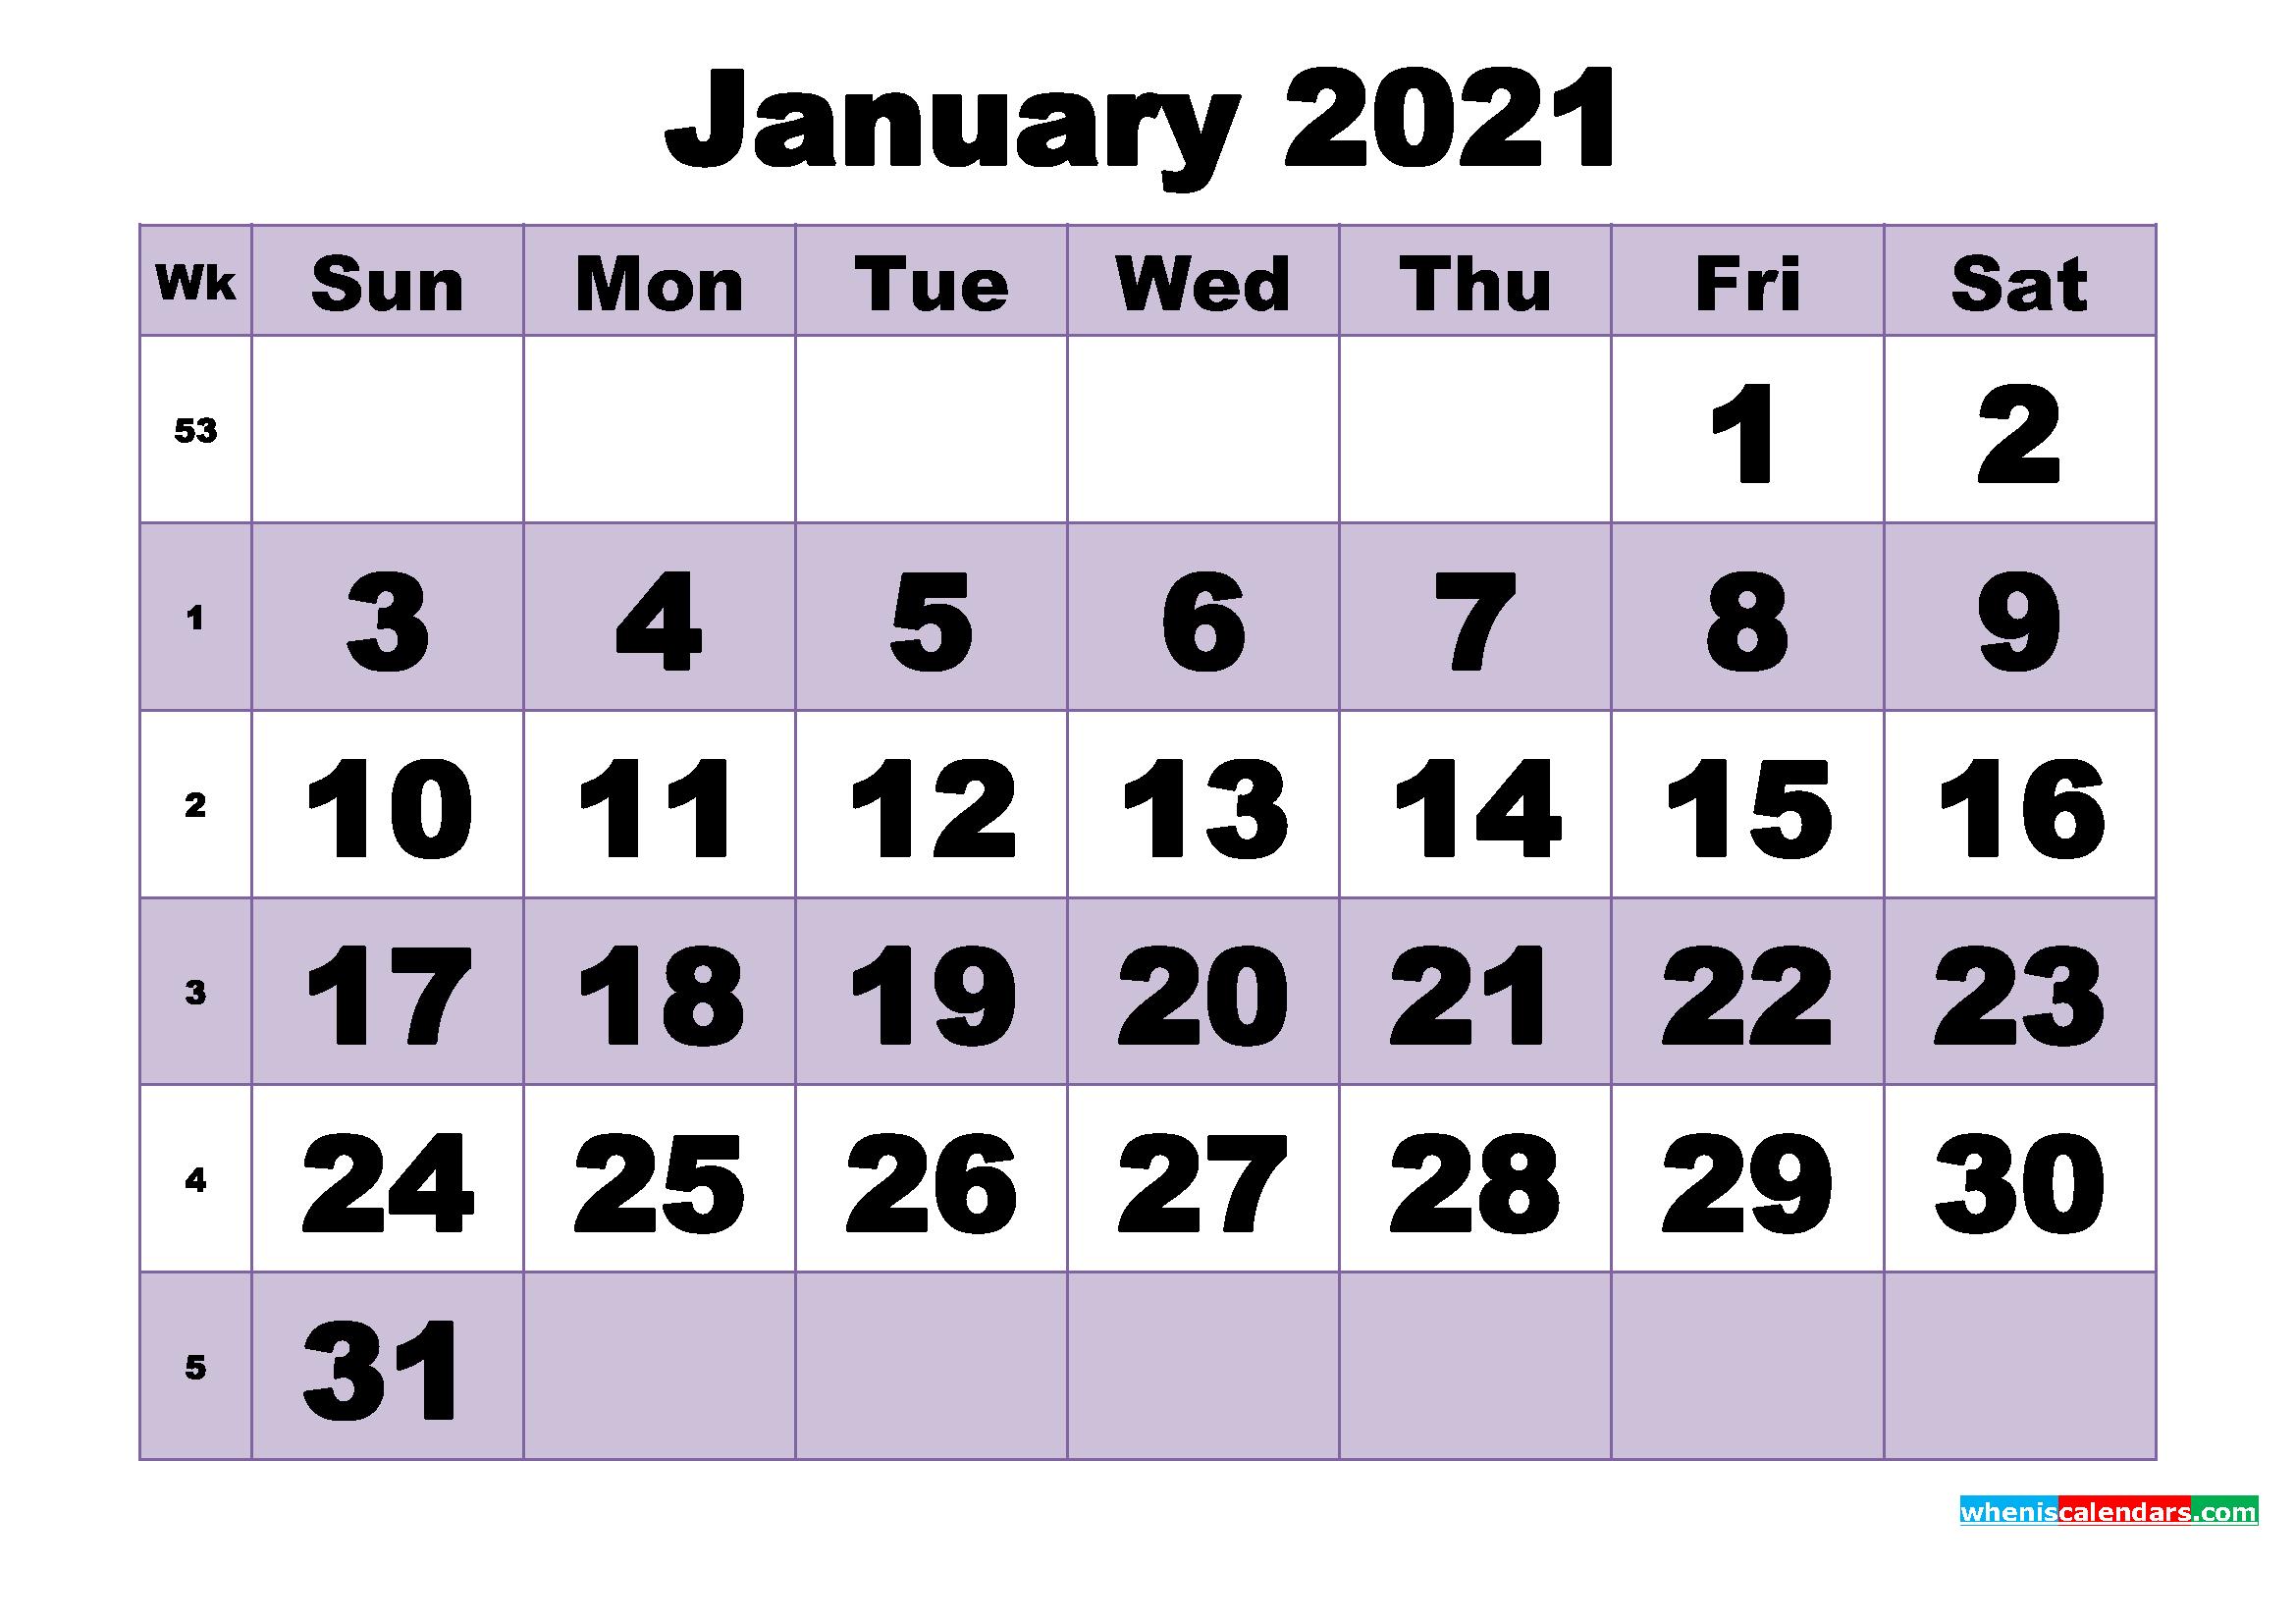 Free January 2021 Printable Monthly Calendar Template - Free Printable 2020 Monthly Calendar